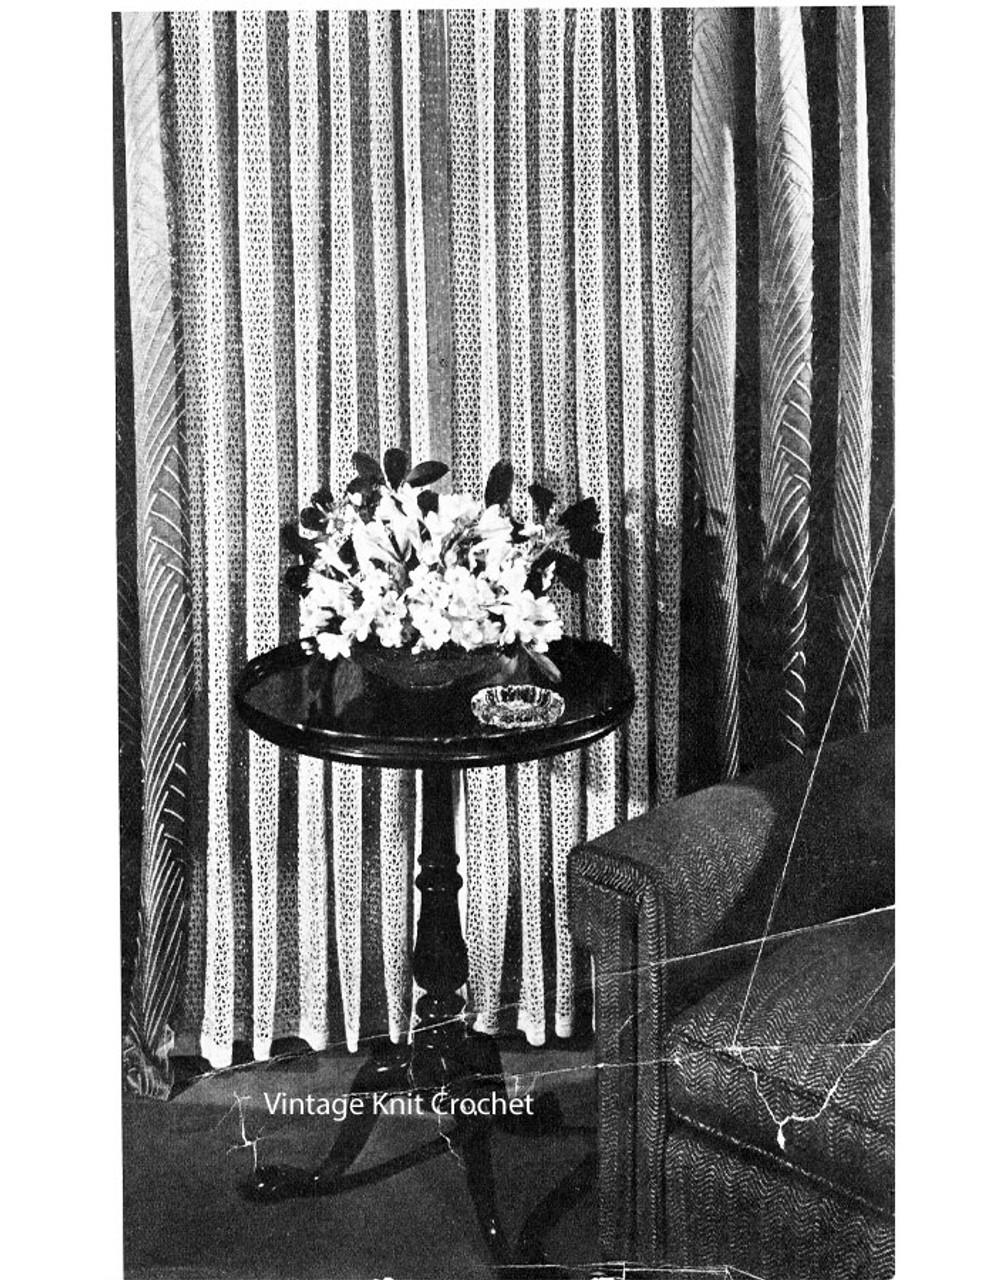 Vintage Crochet Curtain Panel Pattern